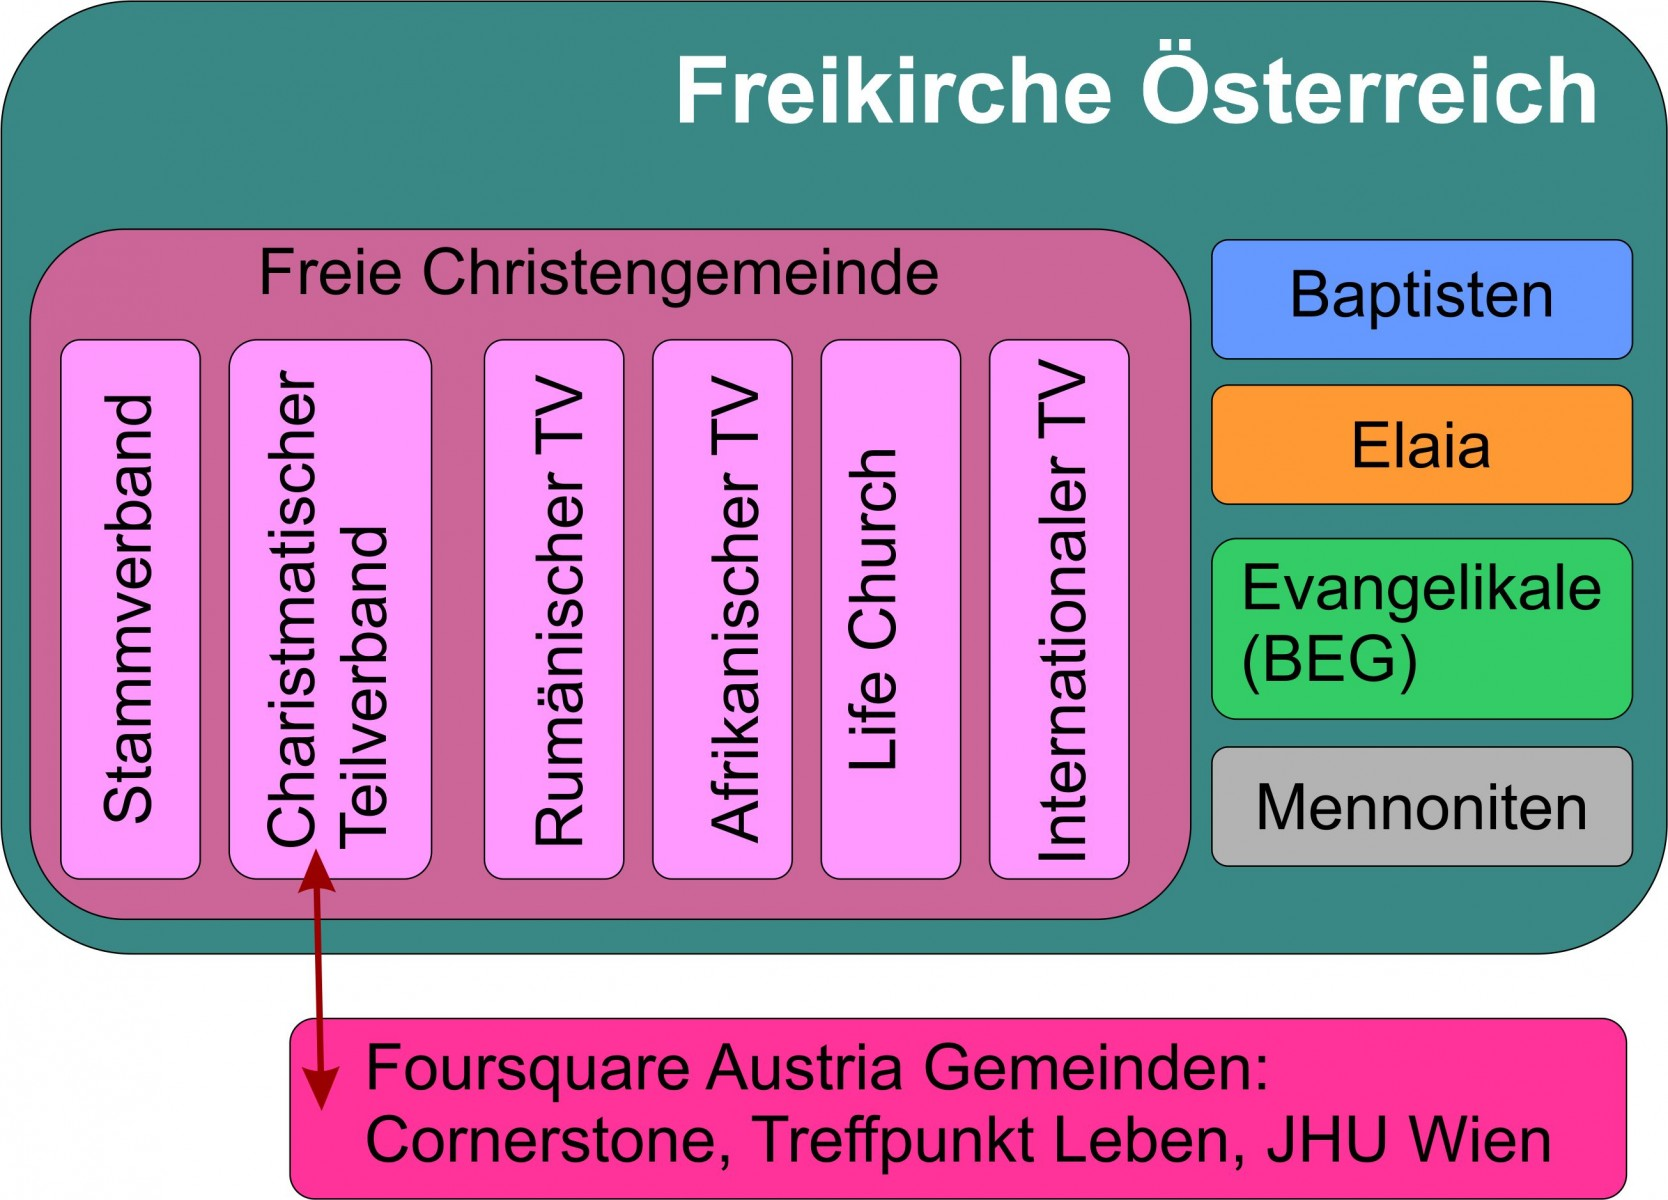 Ueberblick_fkoe